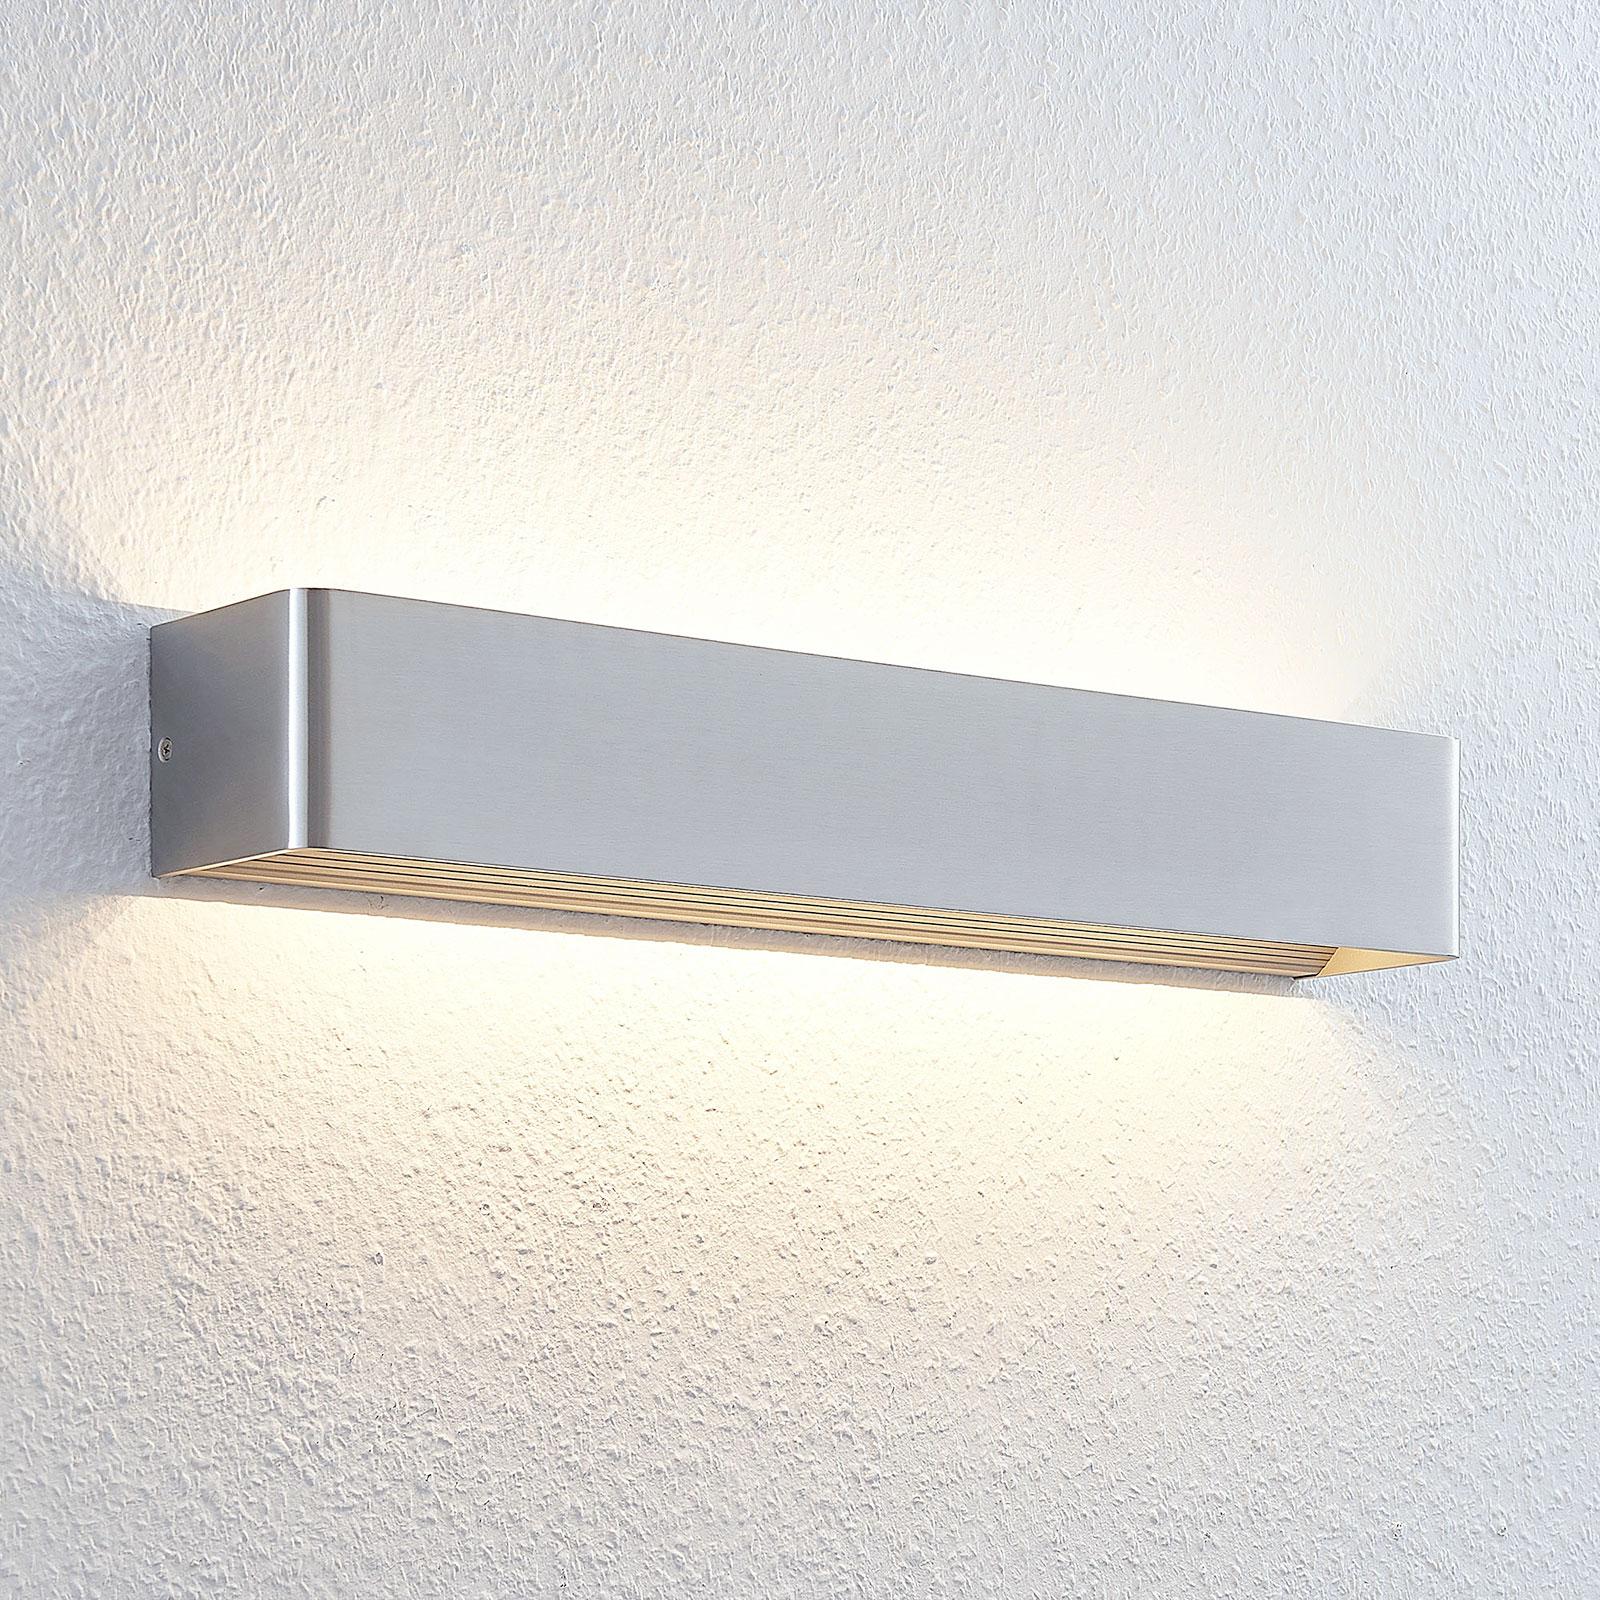 LED-Wandleuchte Lonisa, nickel, 53 cm